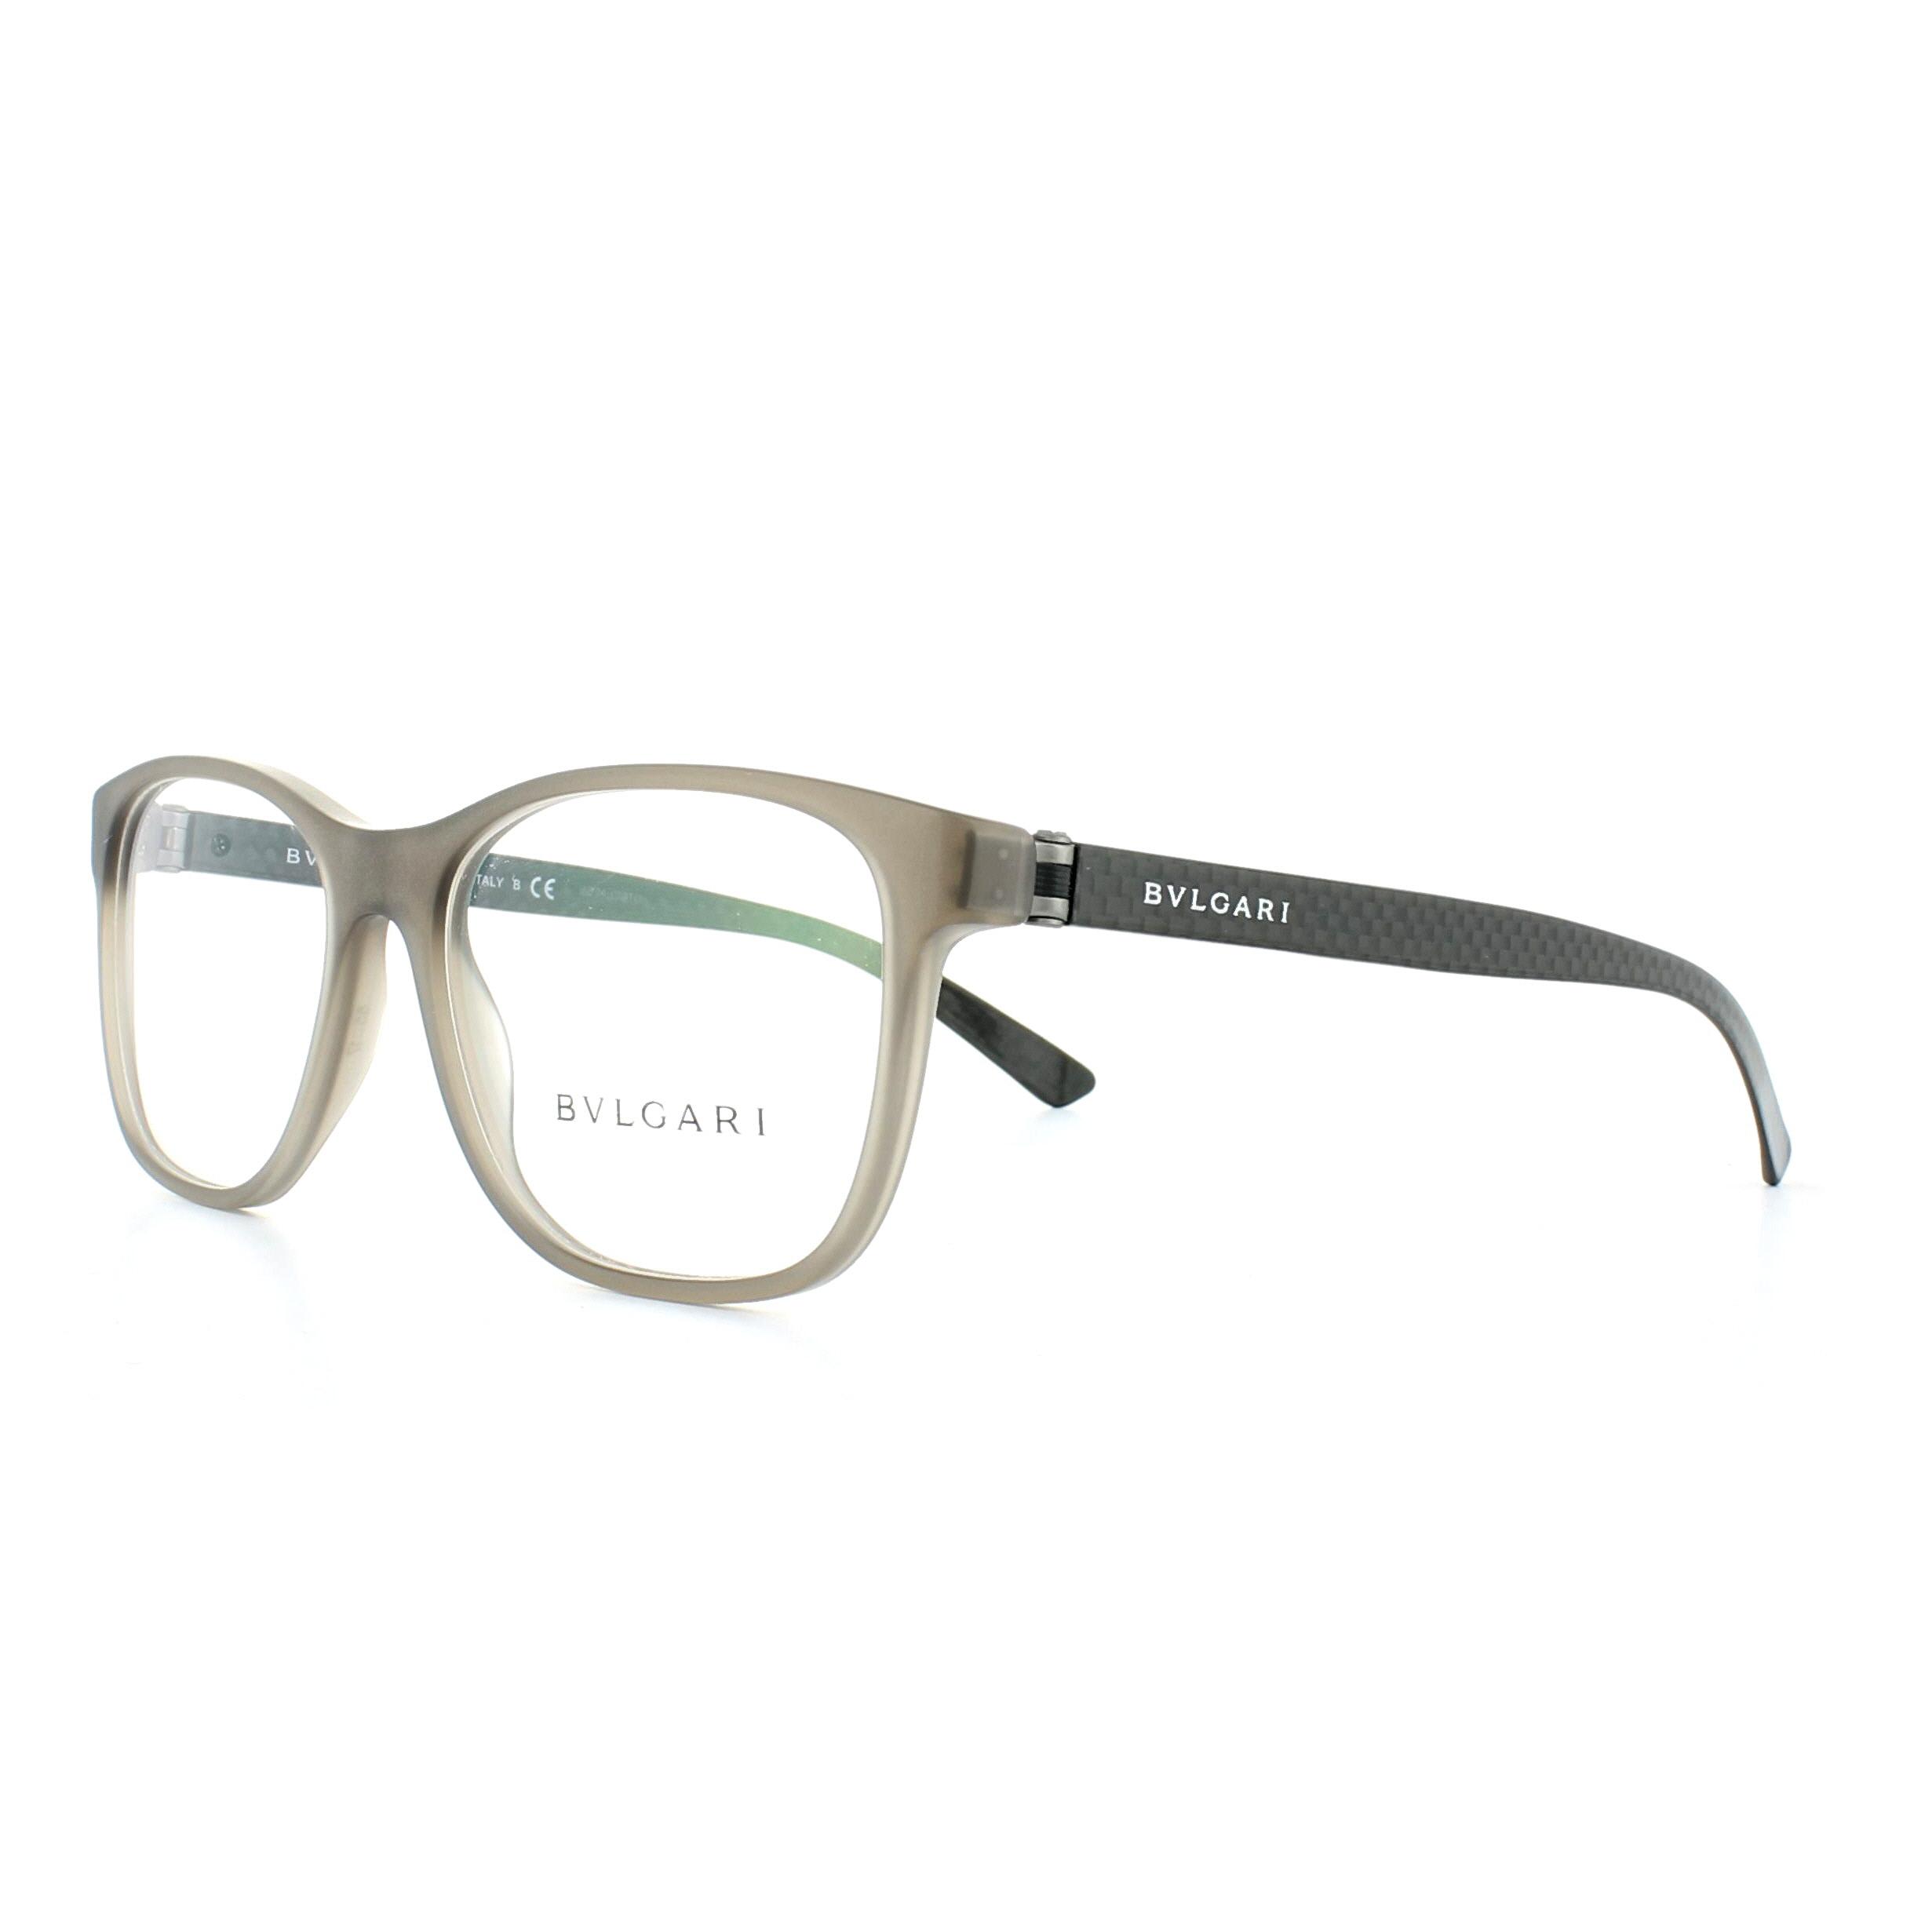 0bafd92999e Details About Bvlgari Glasses Frames 3036 5262 Grey 55mm Mens Womens